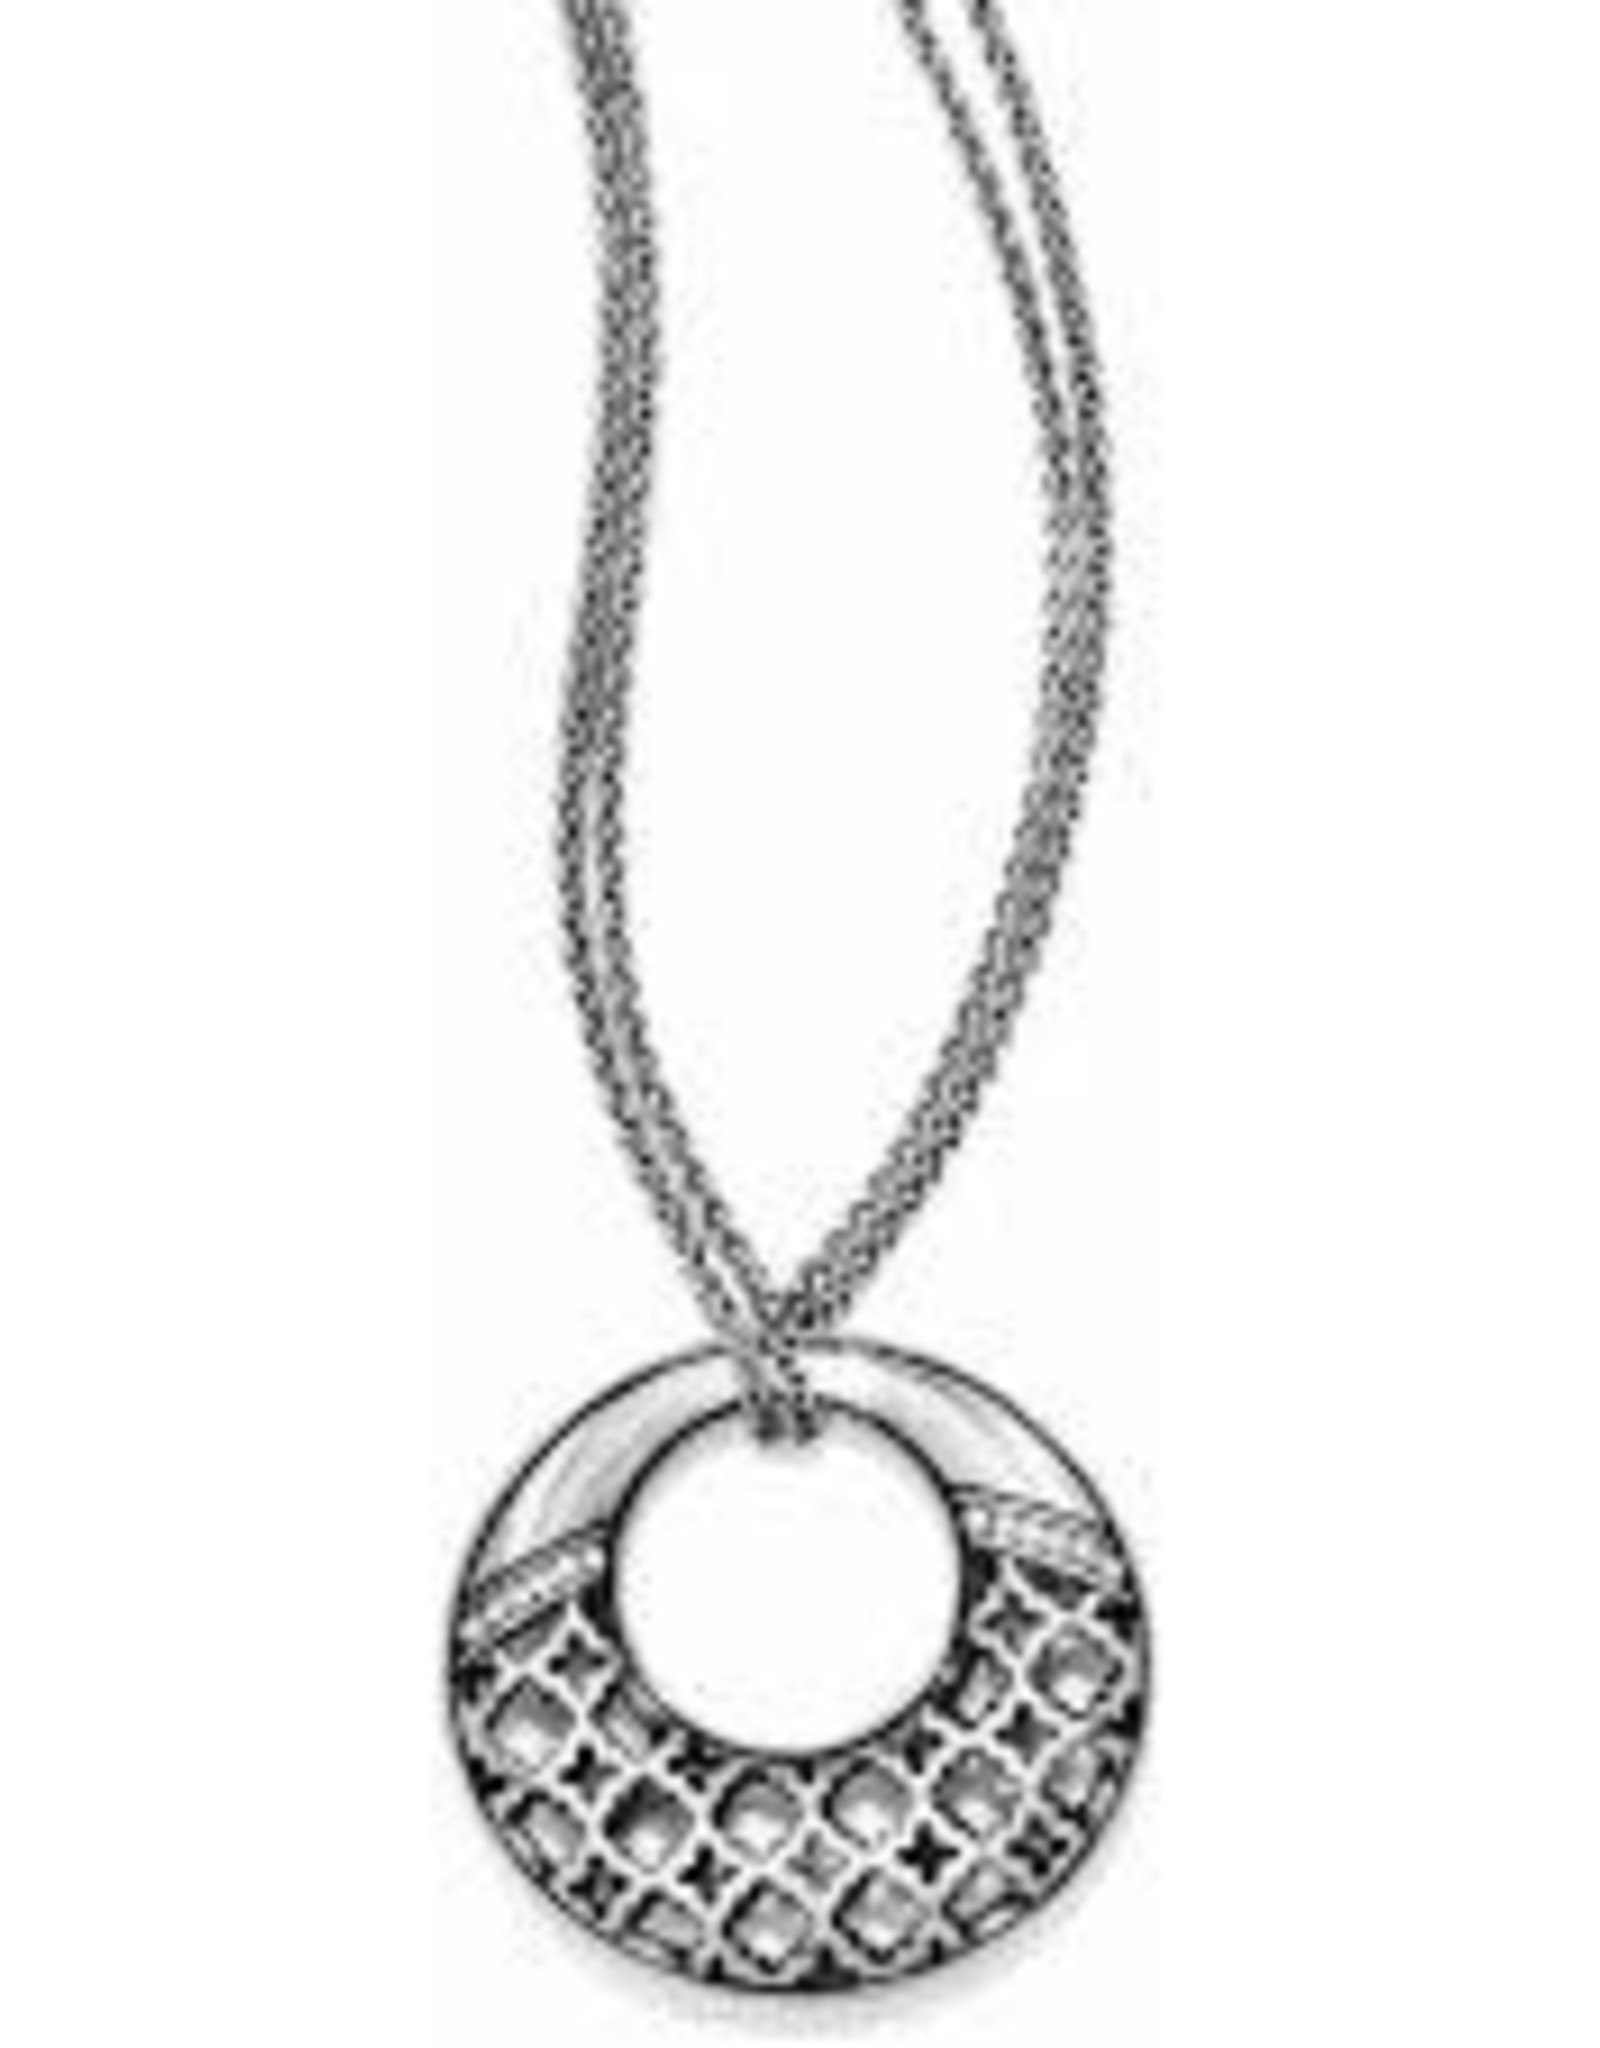 Brighton 40% OFF Brighton, Octavia Luxe Long Necklace FINAL SALE